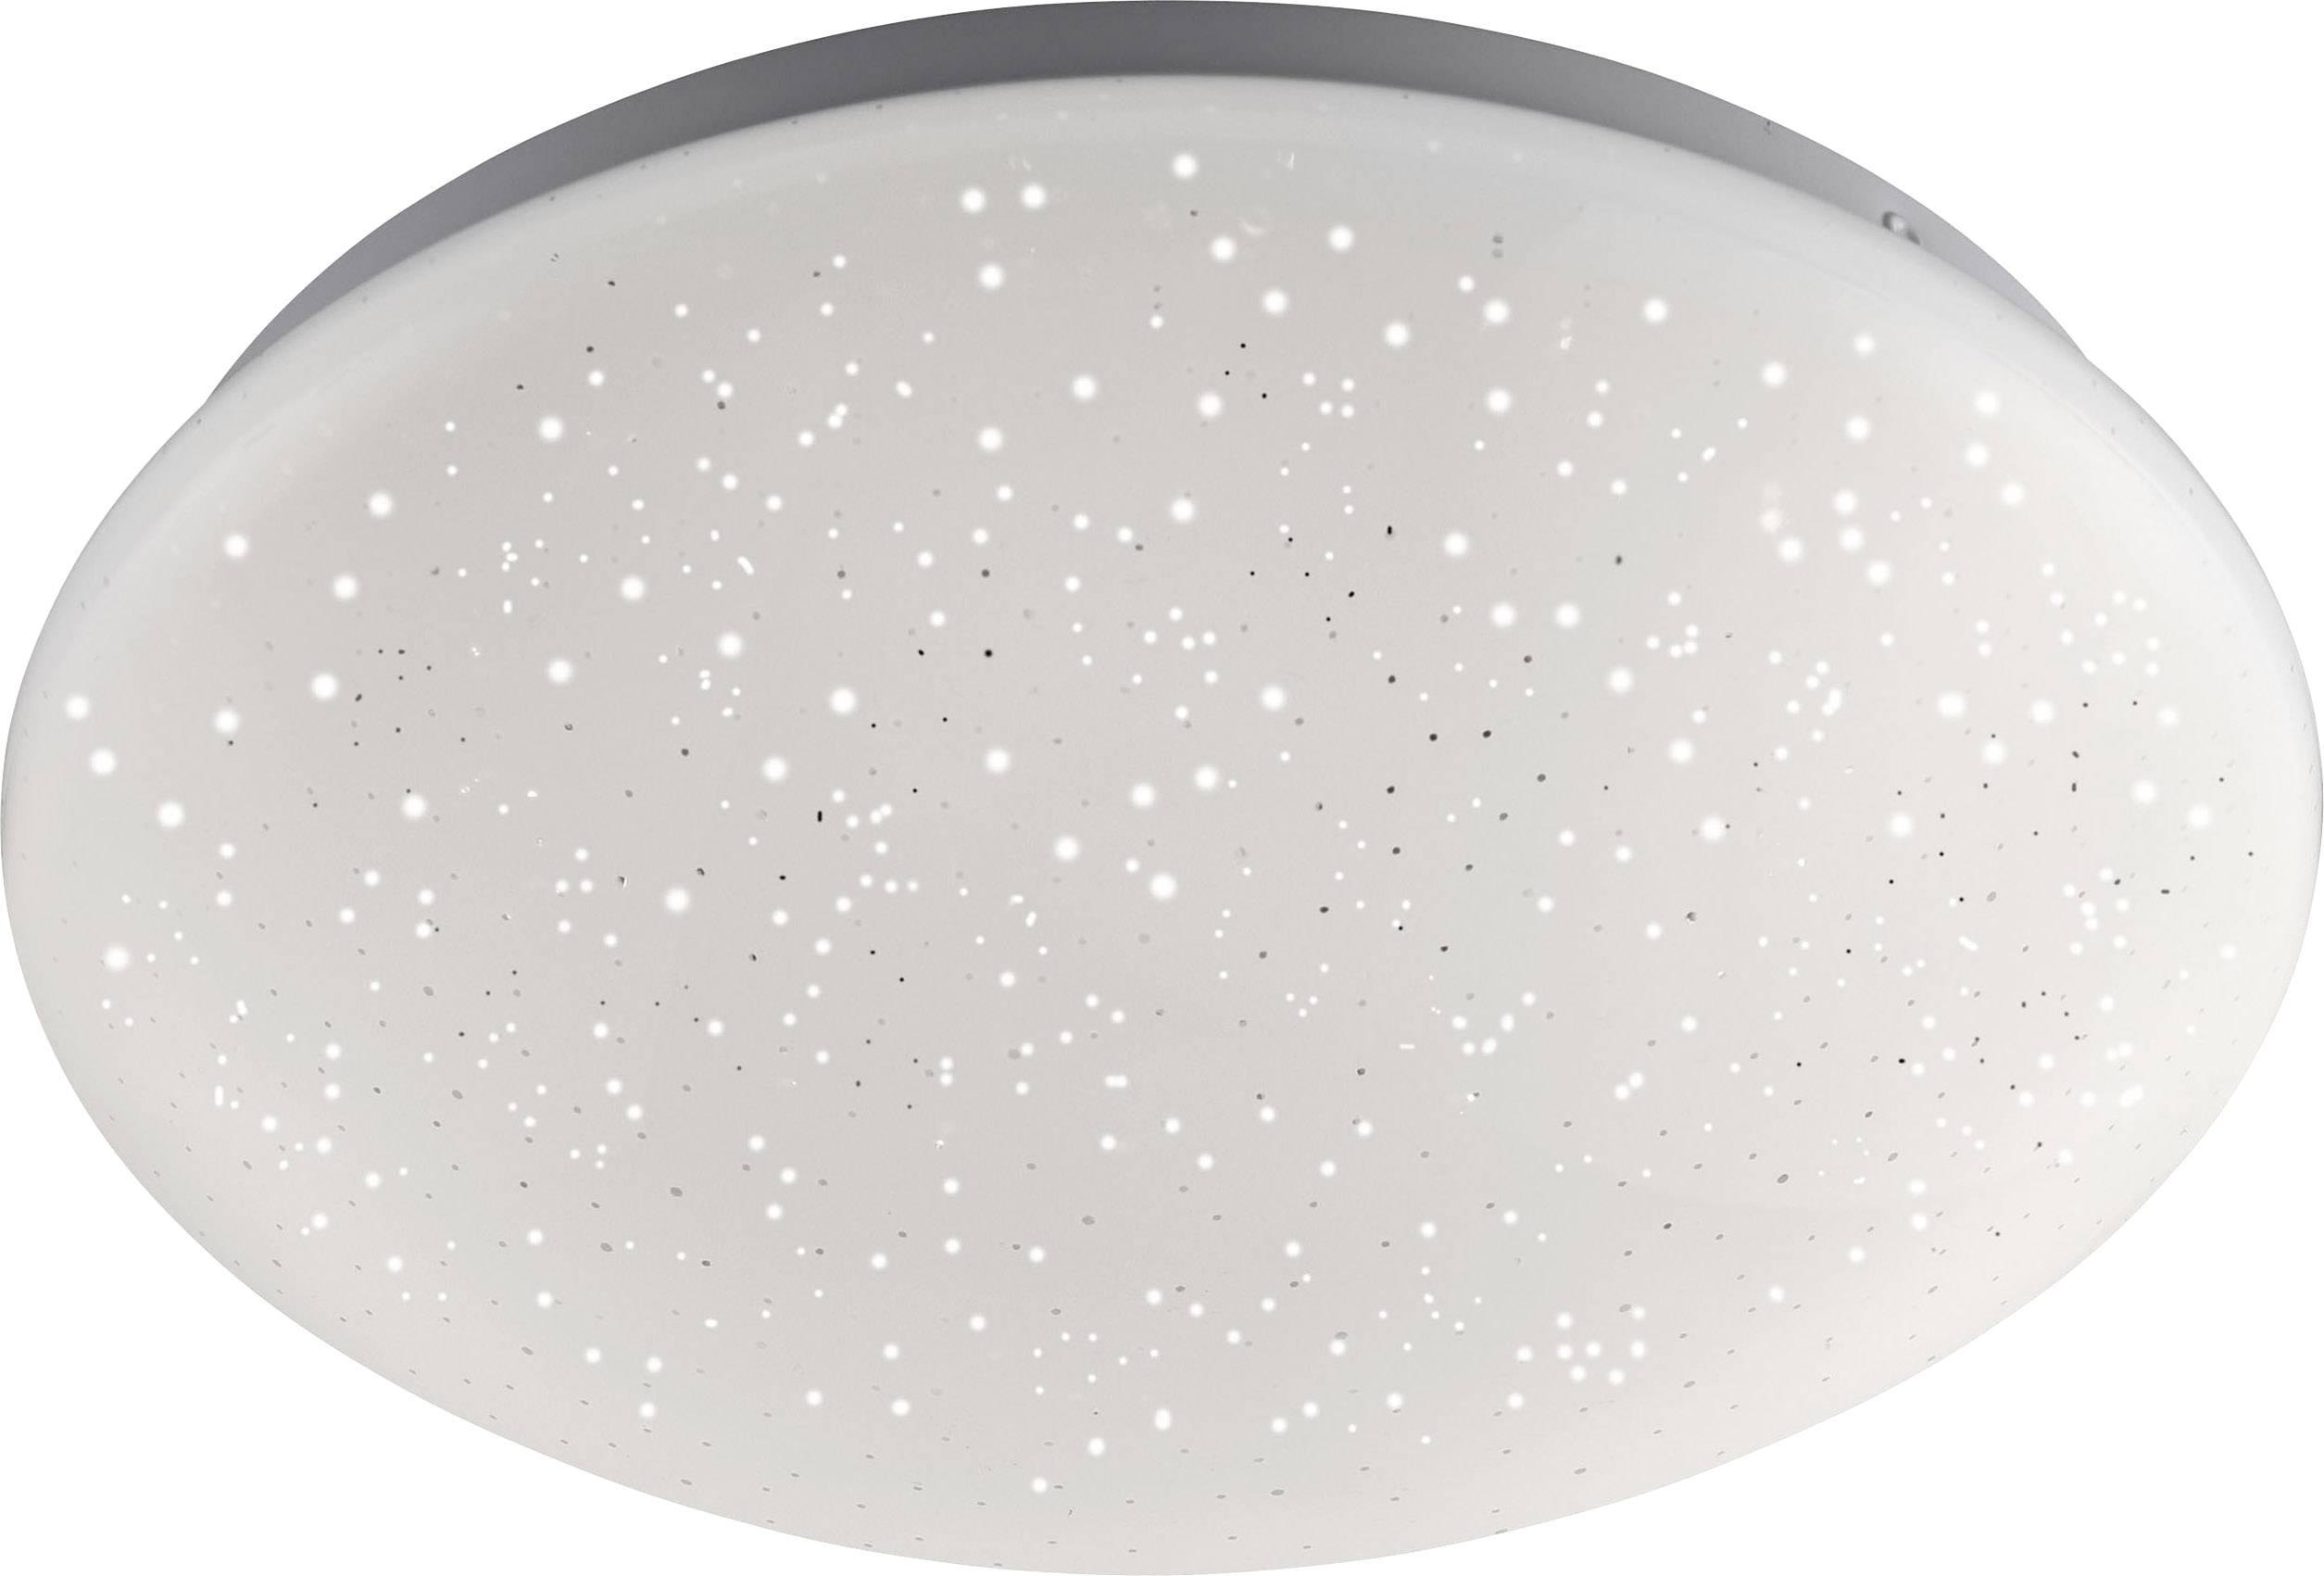 plafonnier led lidl beautiful w lumens solar lights outdoor motion sensor lighting purewarm. Black Bedroom Furniture Sets. Home Design Ideas